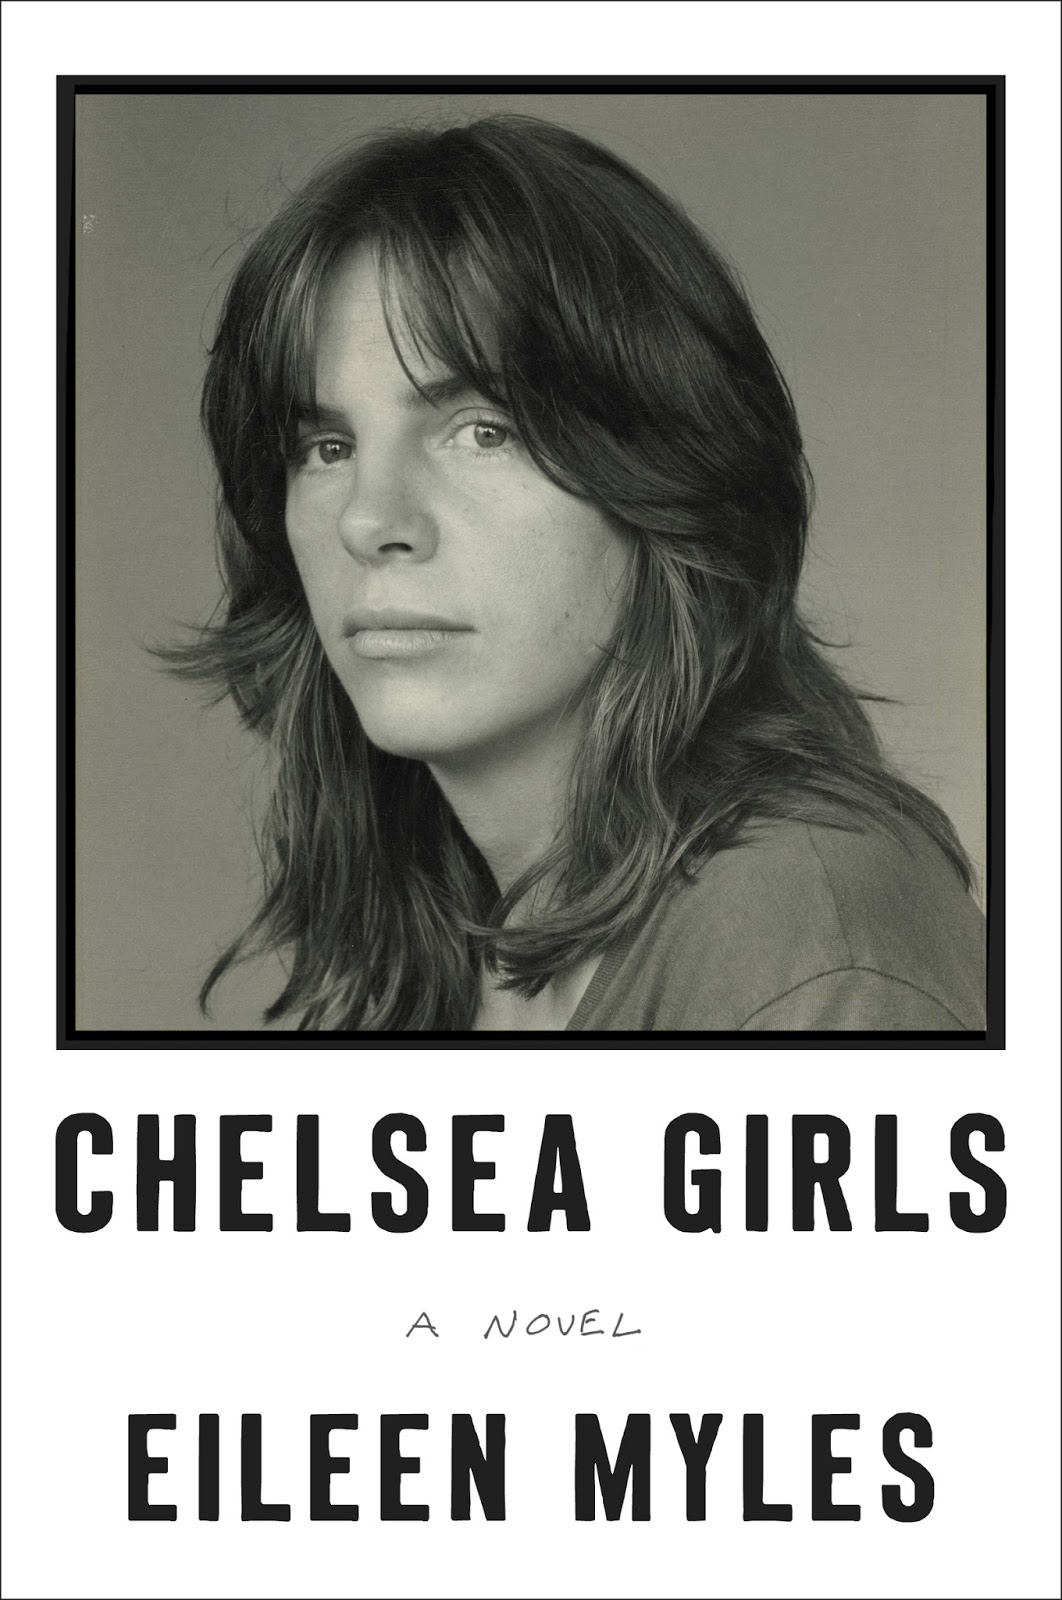 ChelseaGirls pb c.JPG